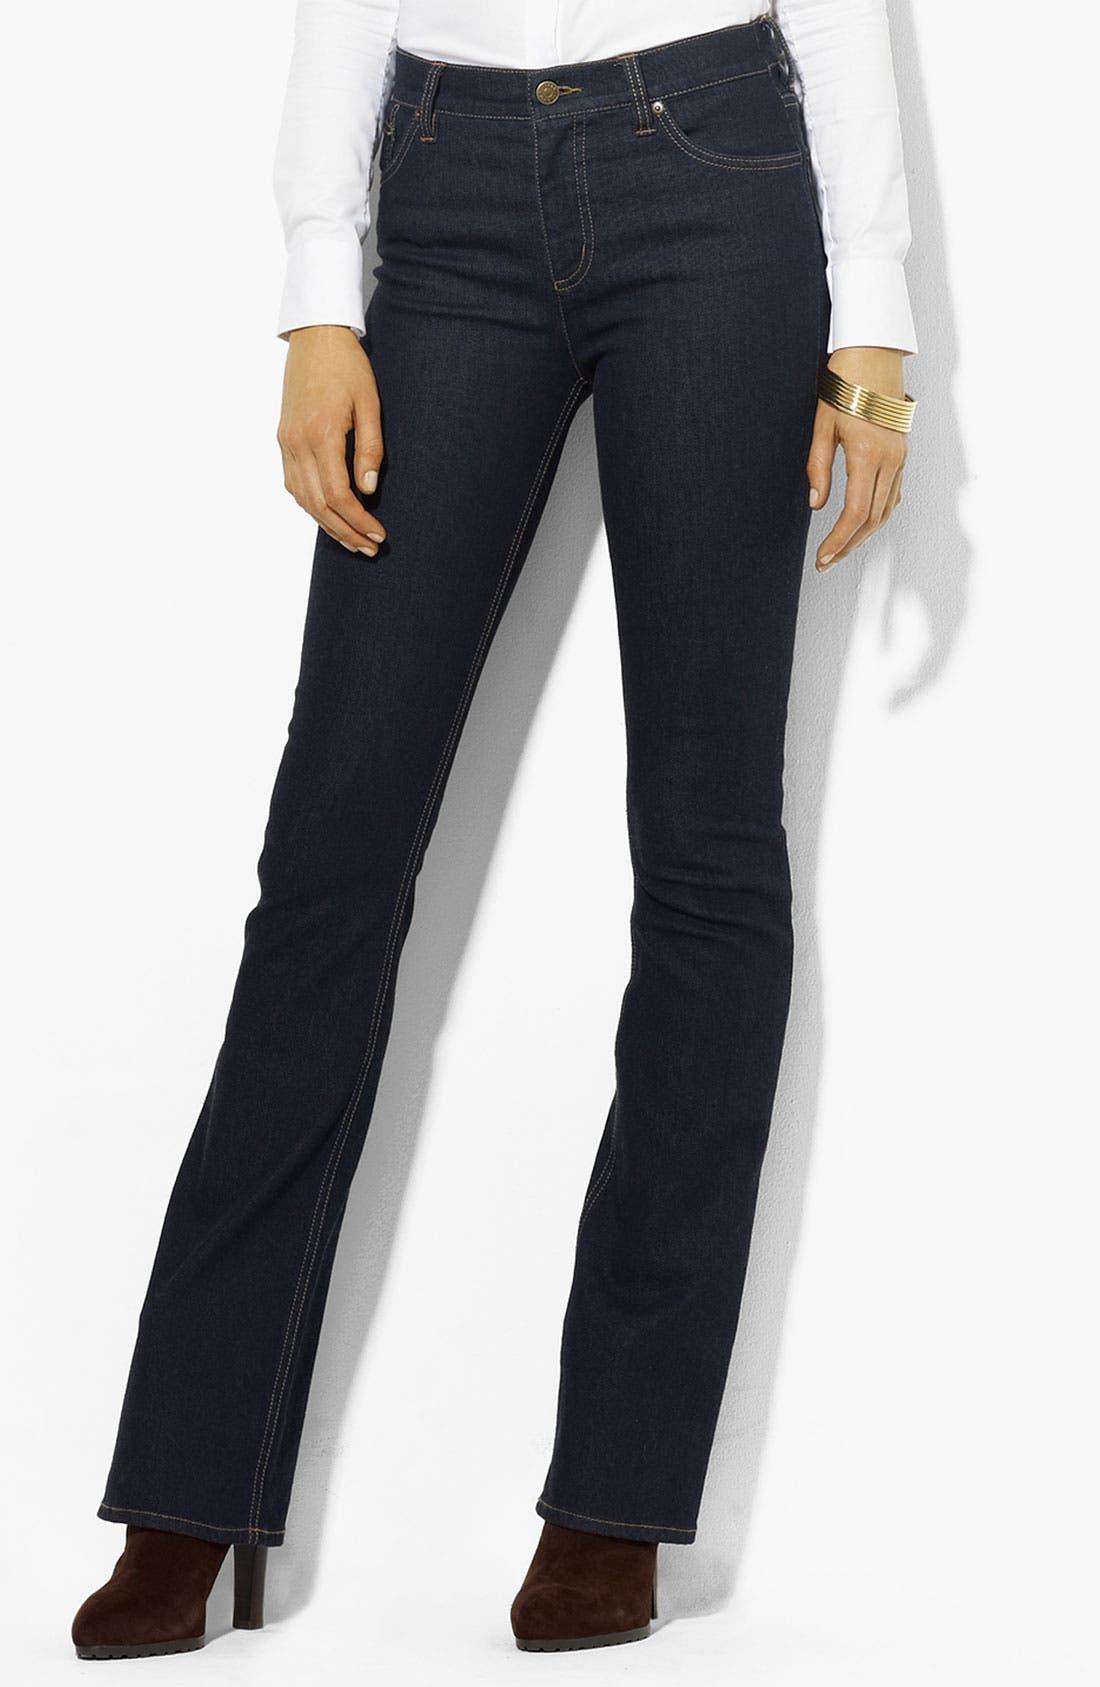 Alternate Image 1 Selected - Lauren Ralph Lauren Slimming Bootcut Jeans (Petite) (Online Only)